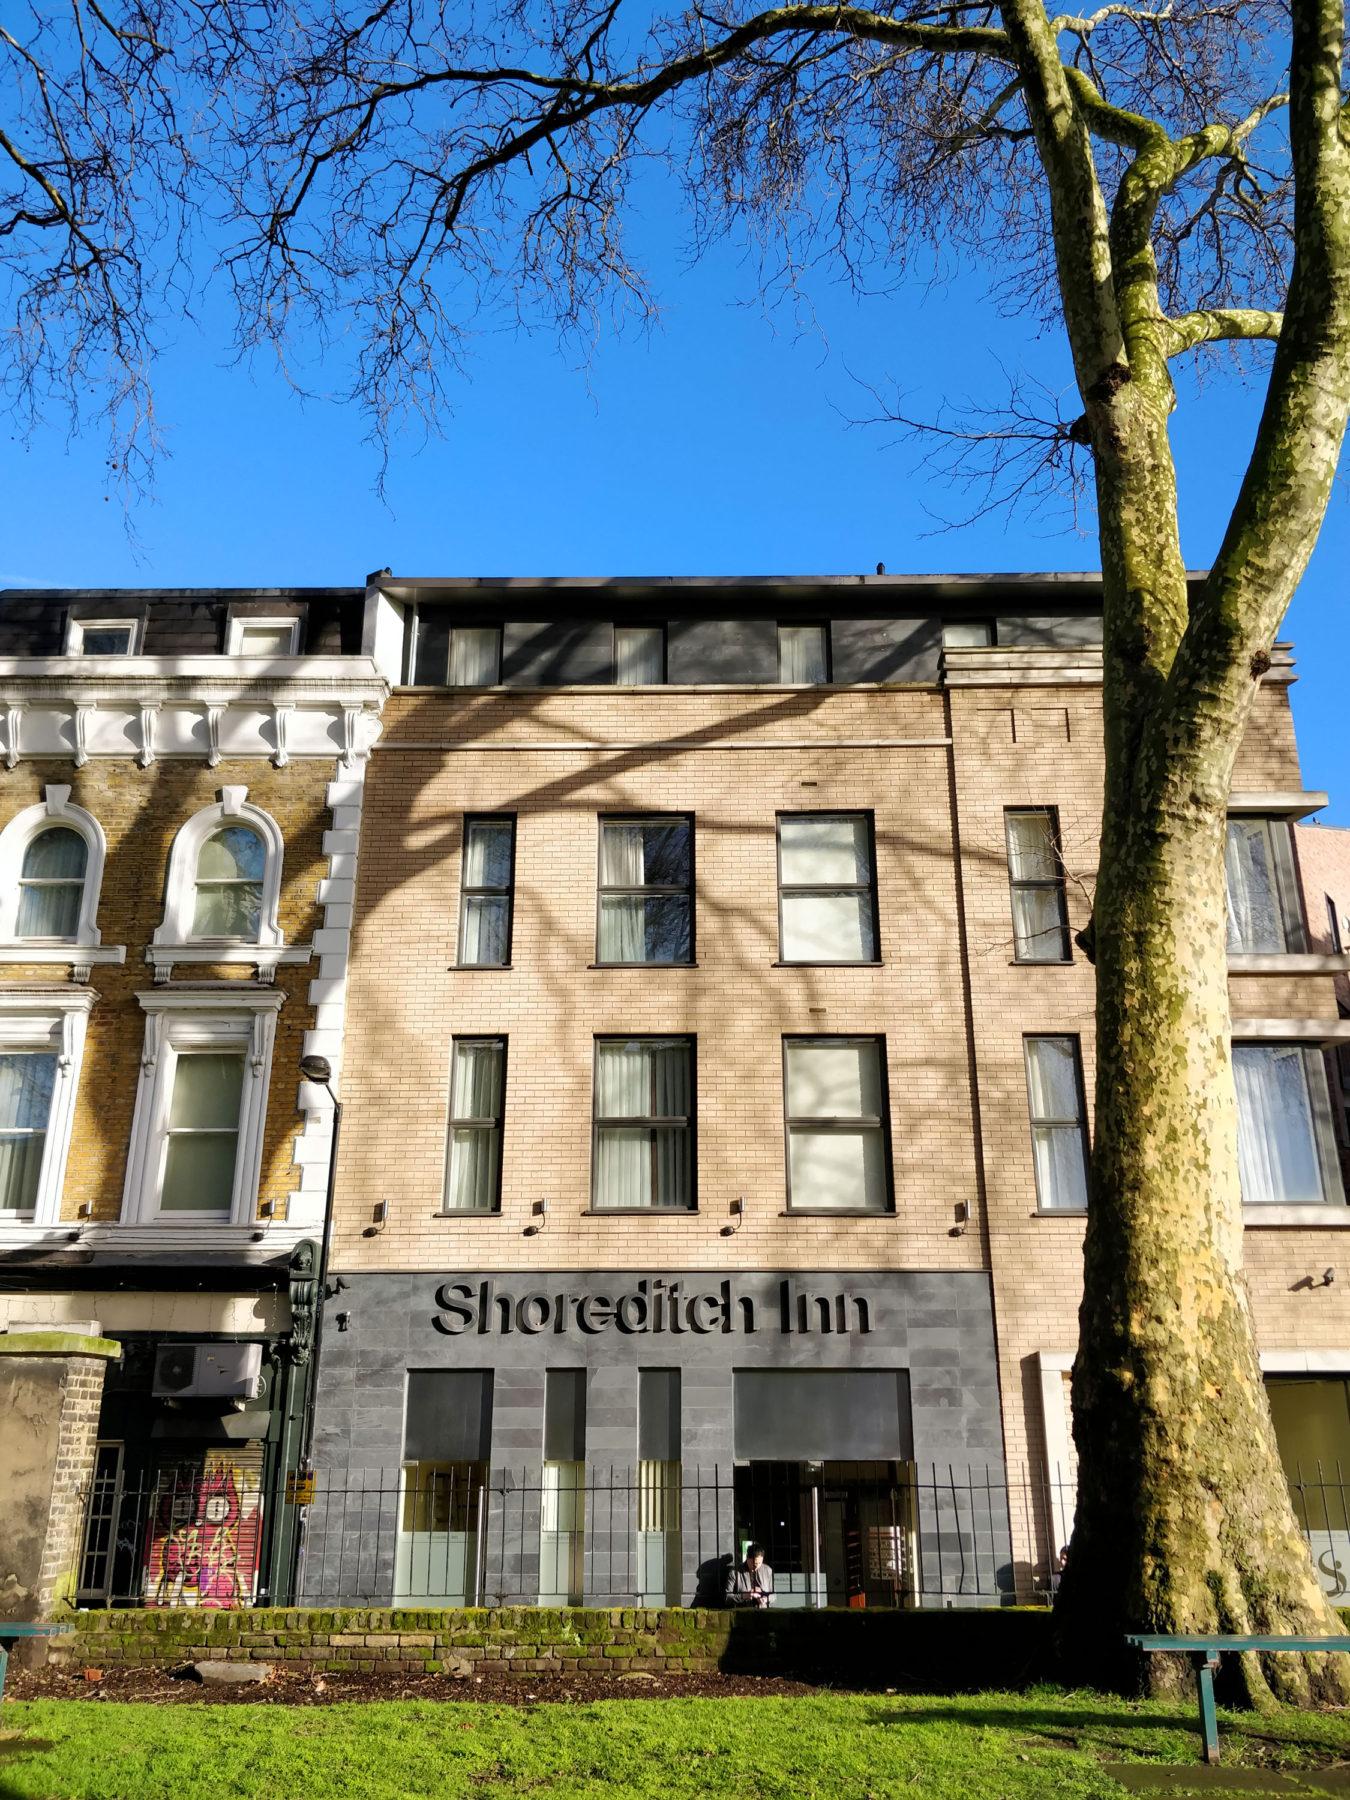 Shoreditch Inn 03 Extension Hotel Entrance